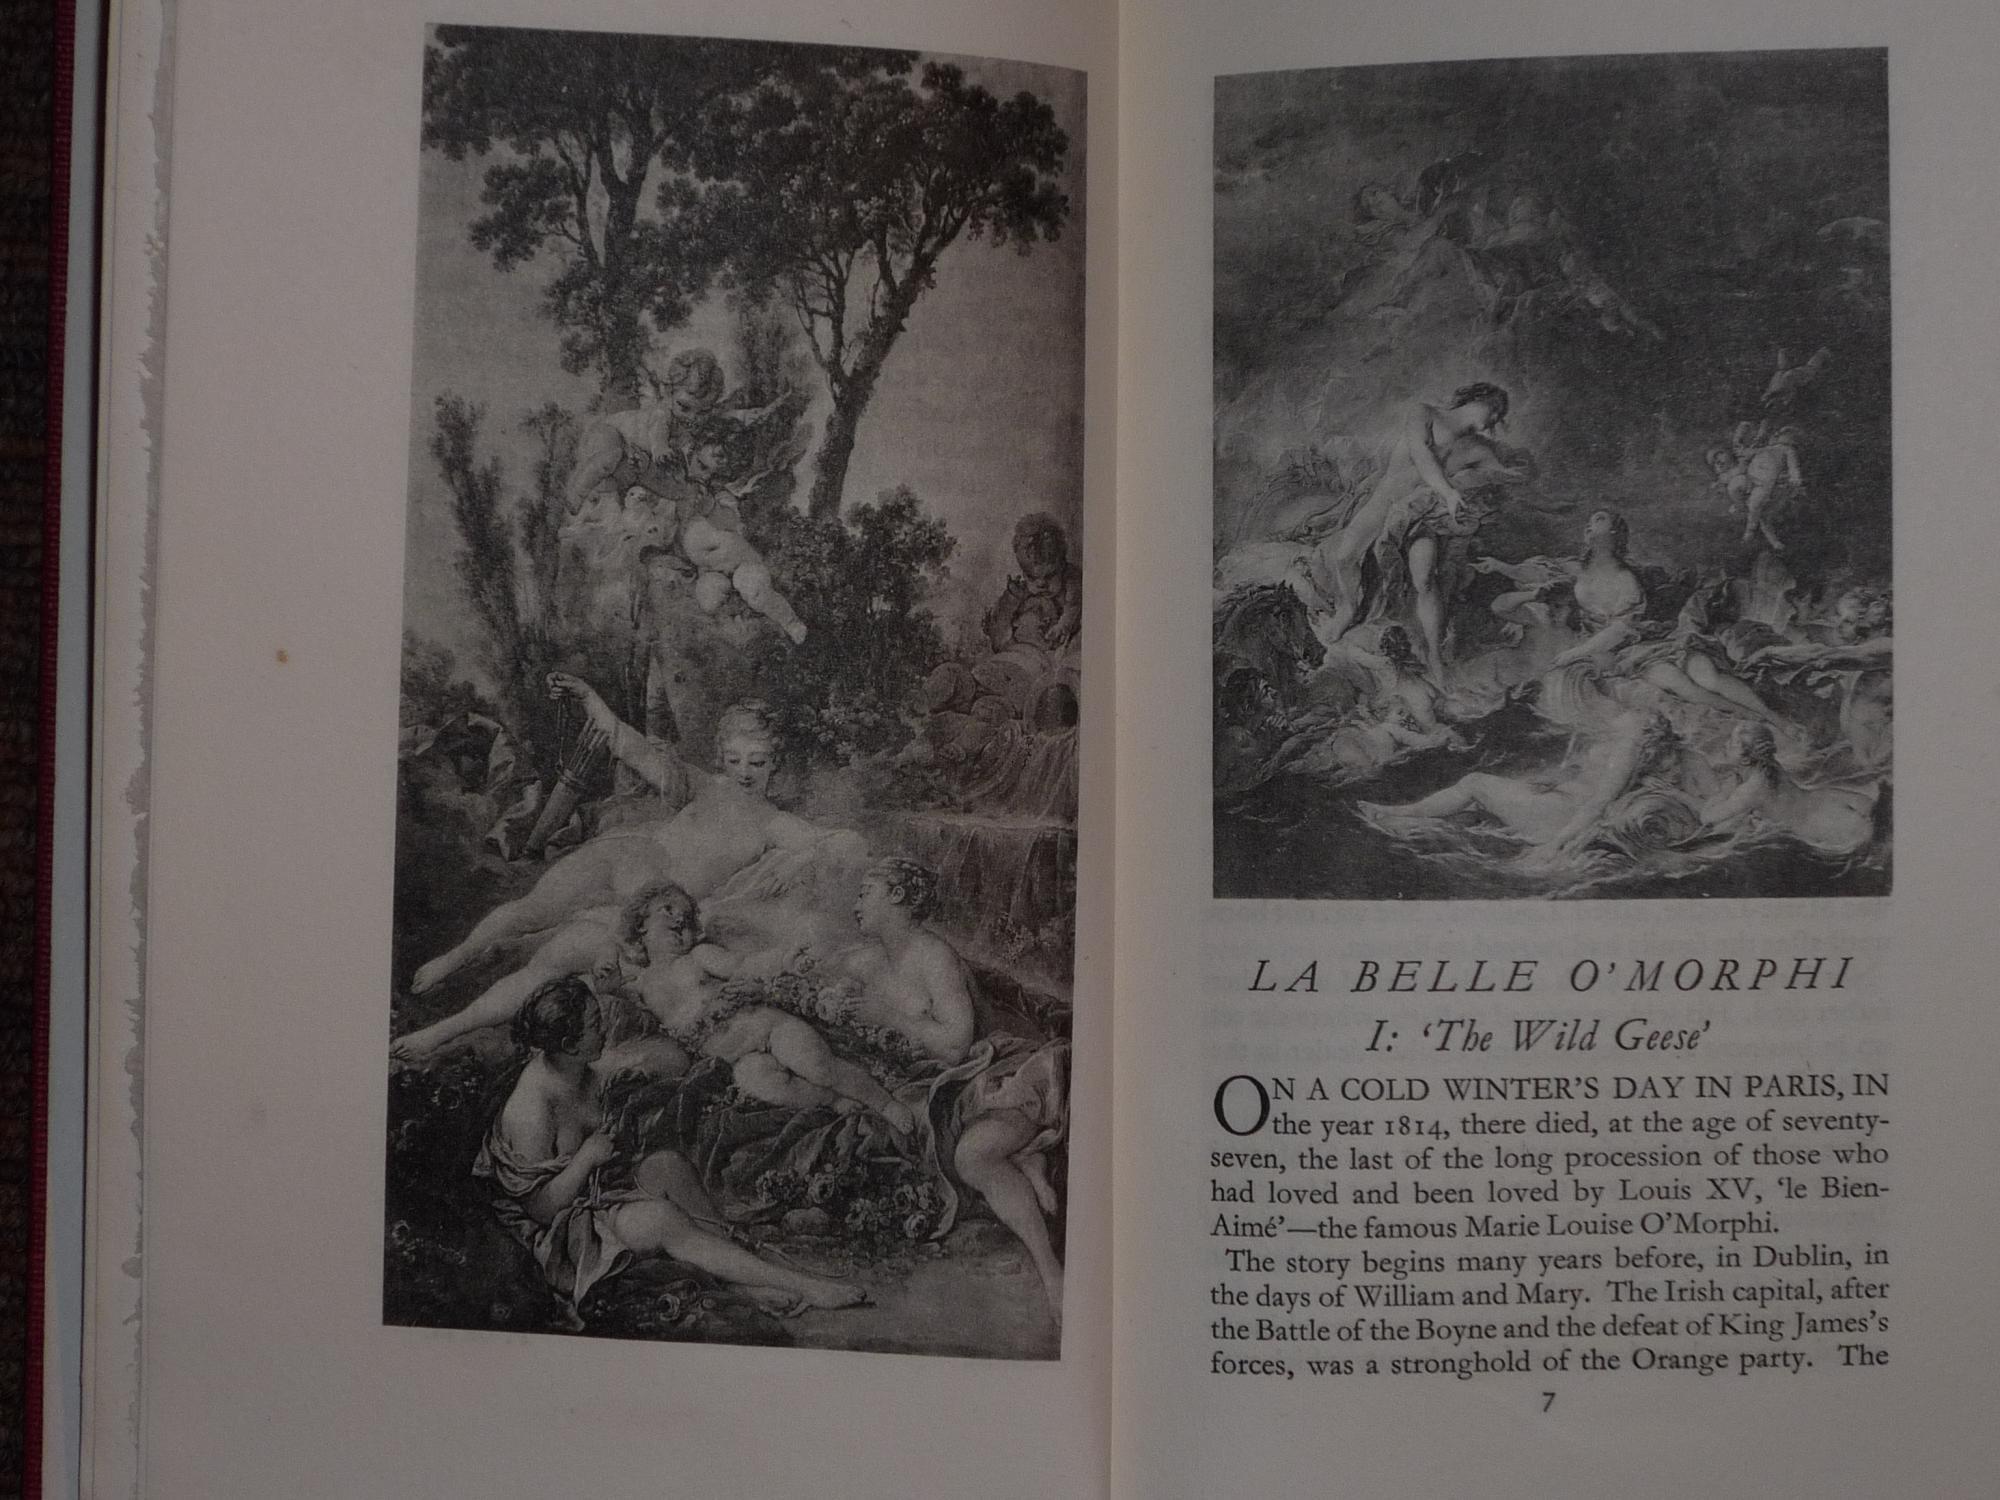 francois boucher biography